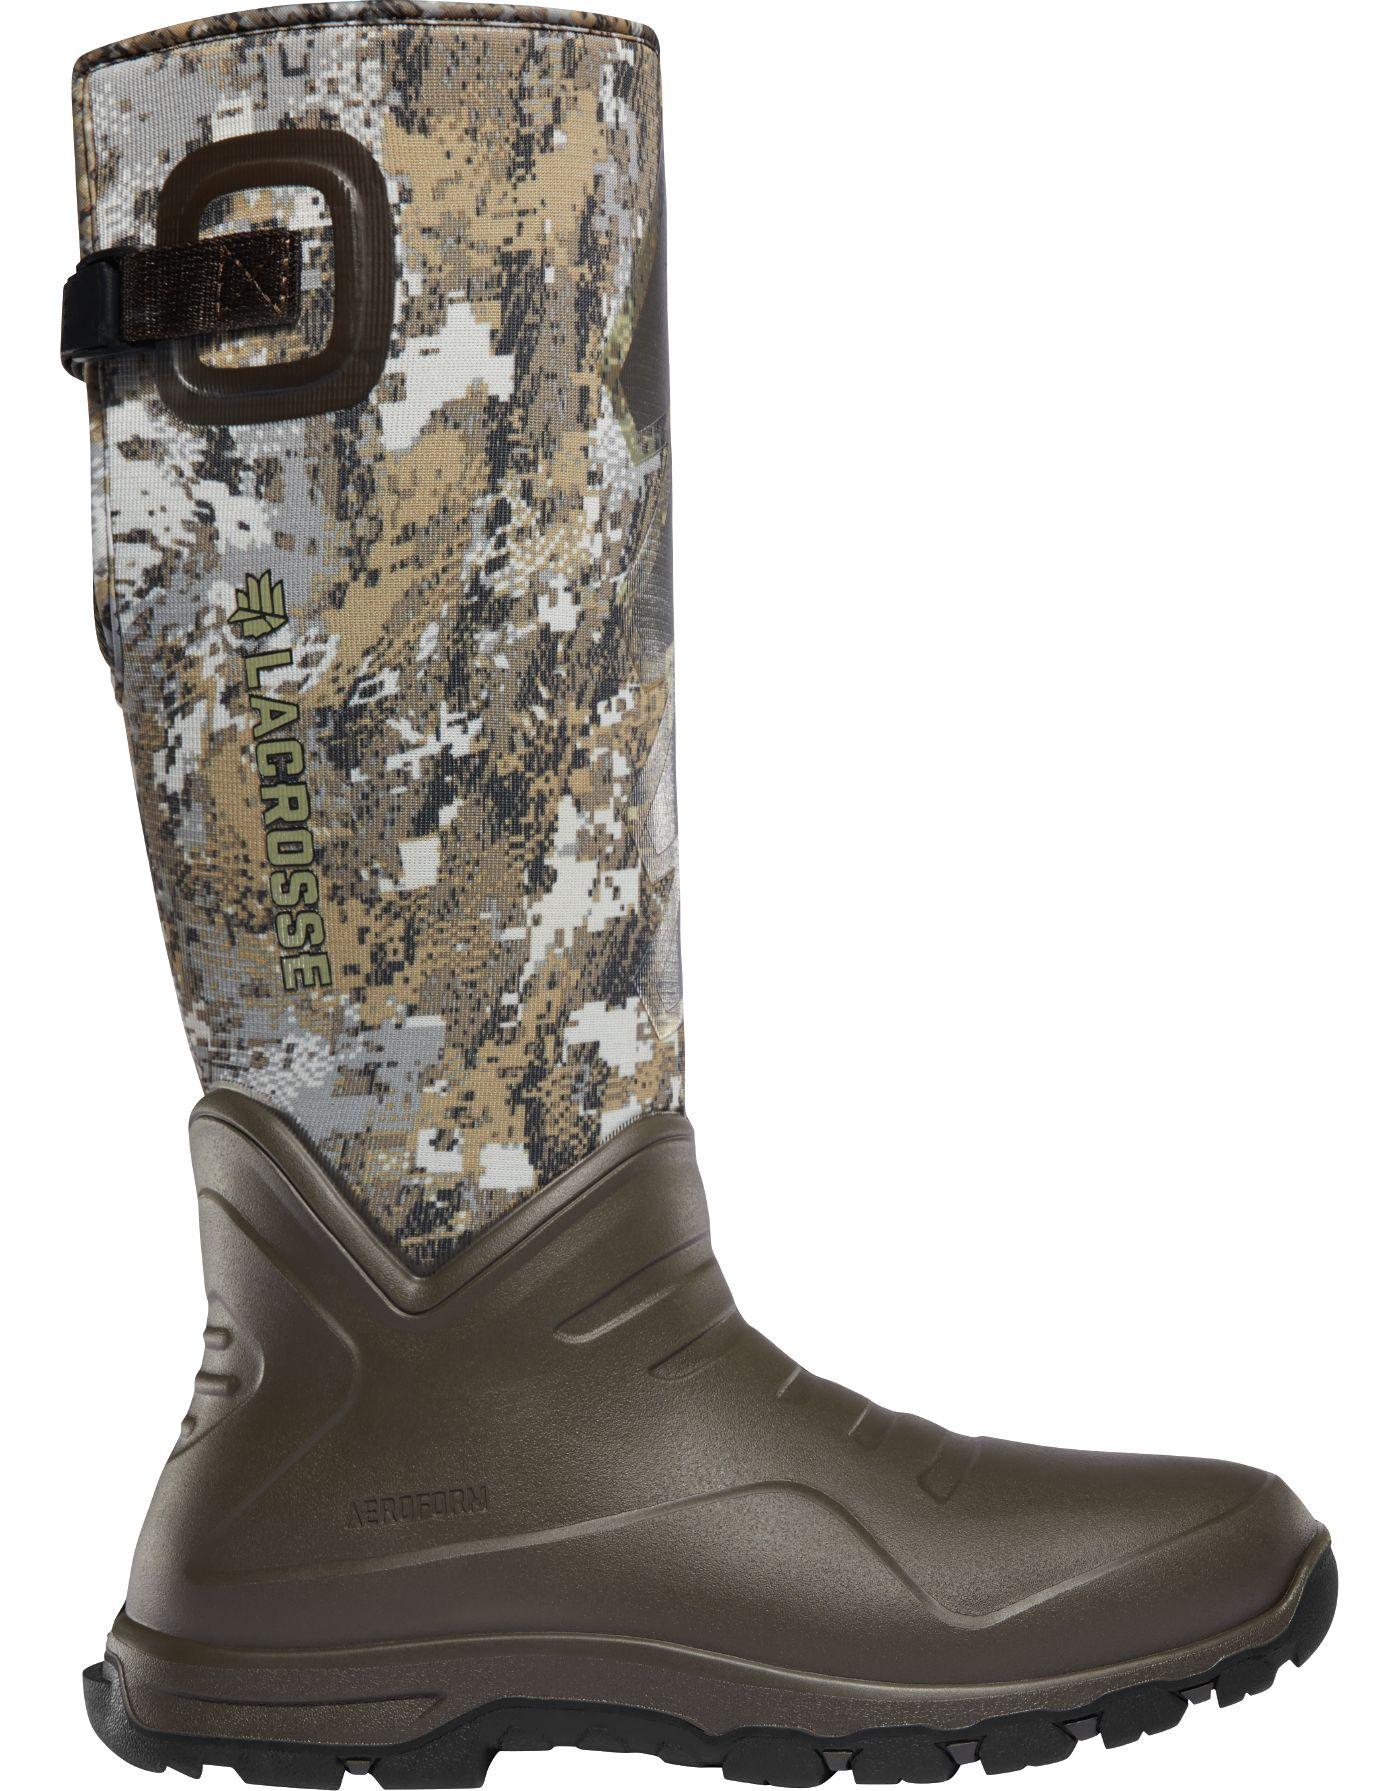 LaCrosse Men's AeroHead Sport 16'' Gore OPTIFADE Elevated II 7.0mm Waterproof Hunting Boots